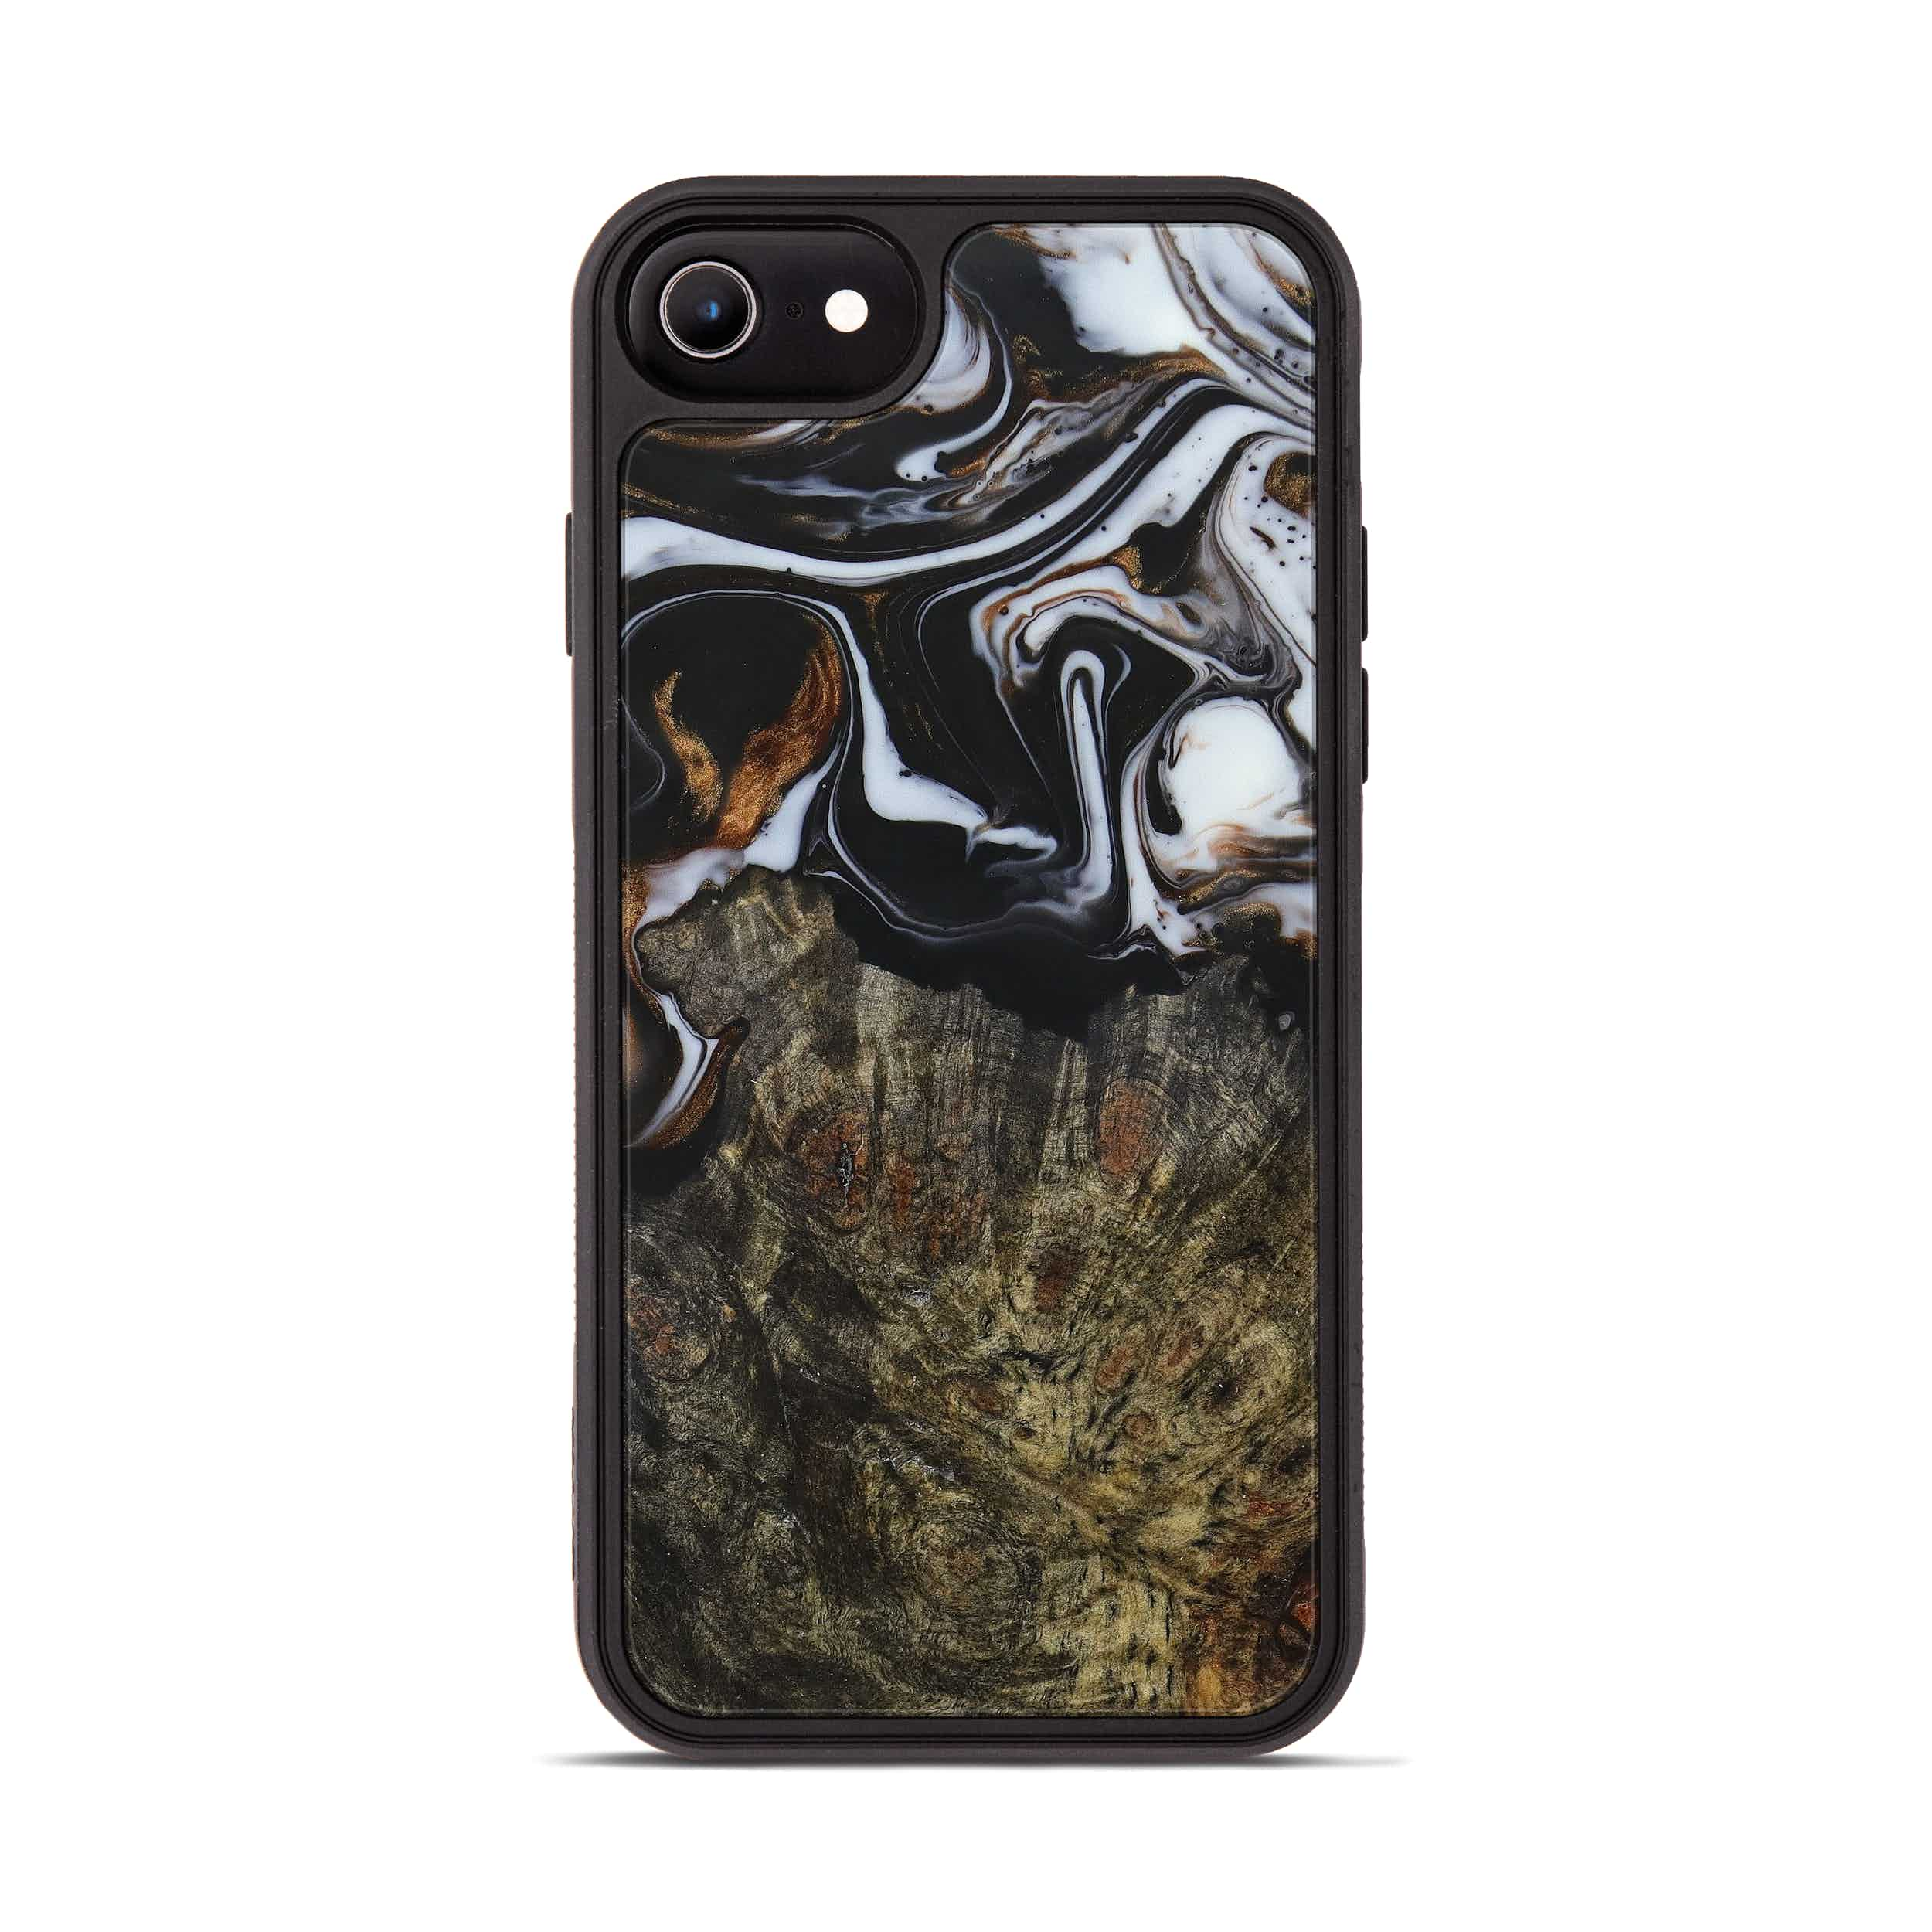 iPhone 8 Wood+Resin Phone Case - Nalani (Black & White, 390670)